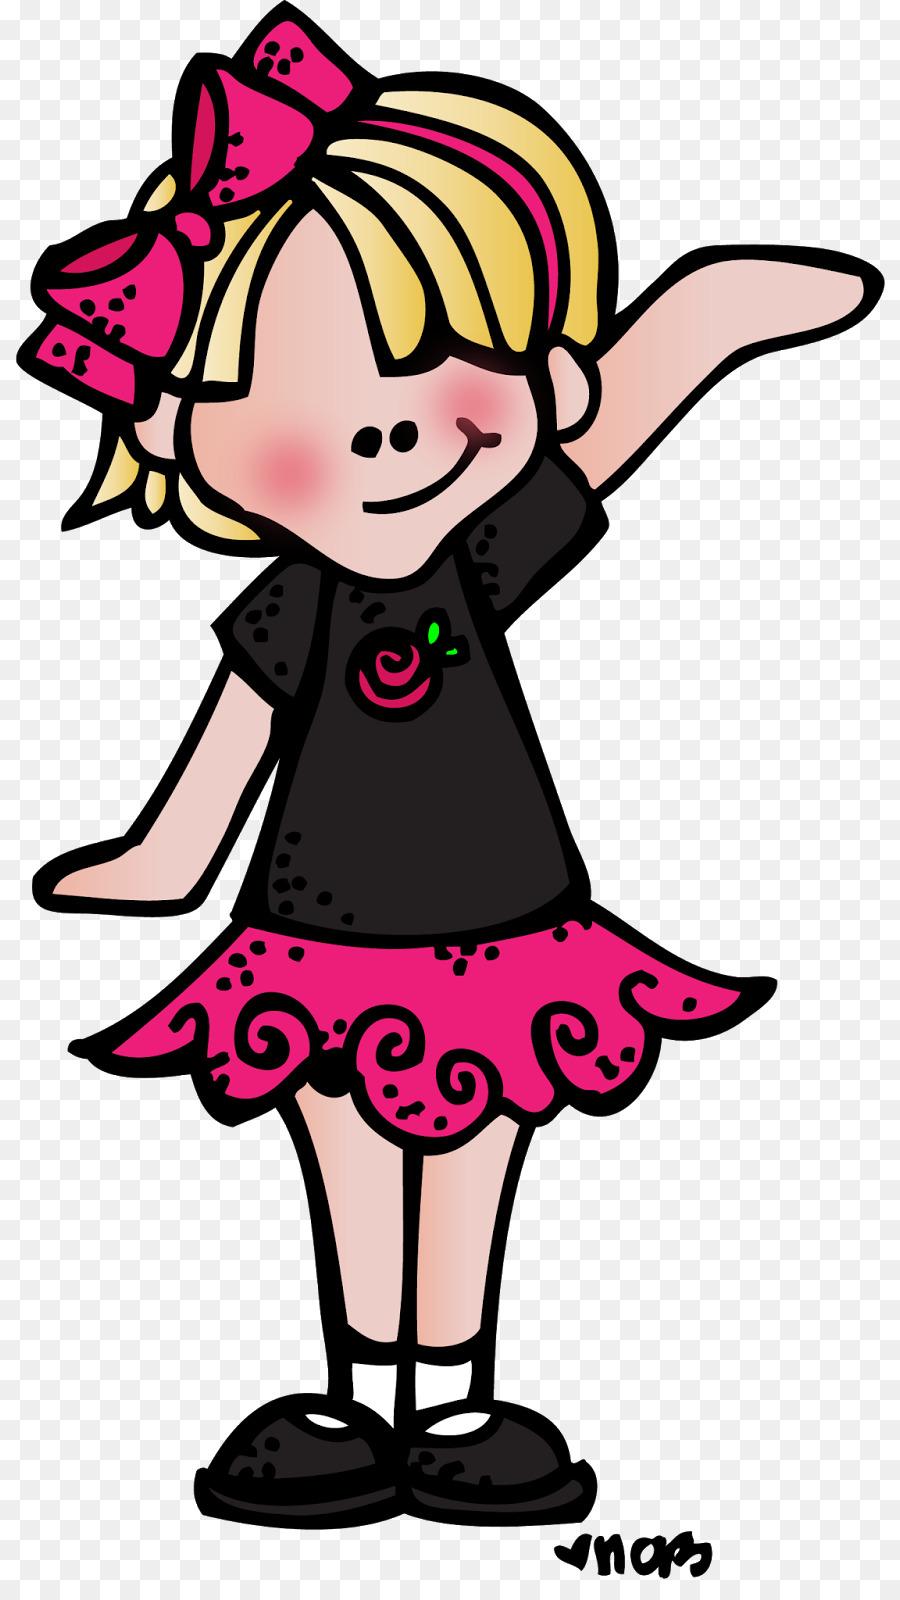 clip art goldilocks clipart png download 870 1600 free rh kisspng com free clipart goldilocks and the three bears goldilocks clipart black and white